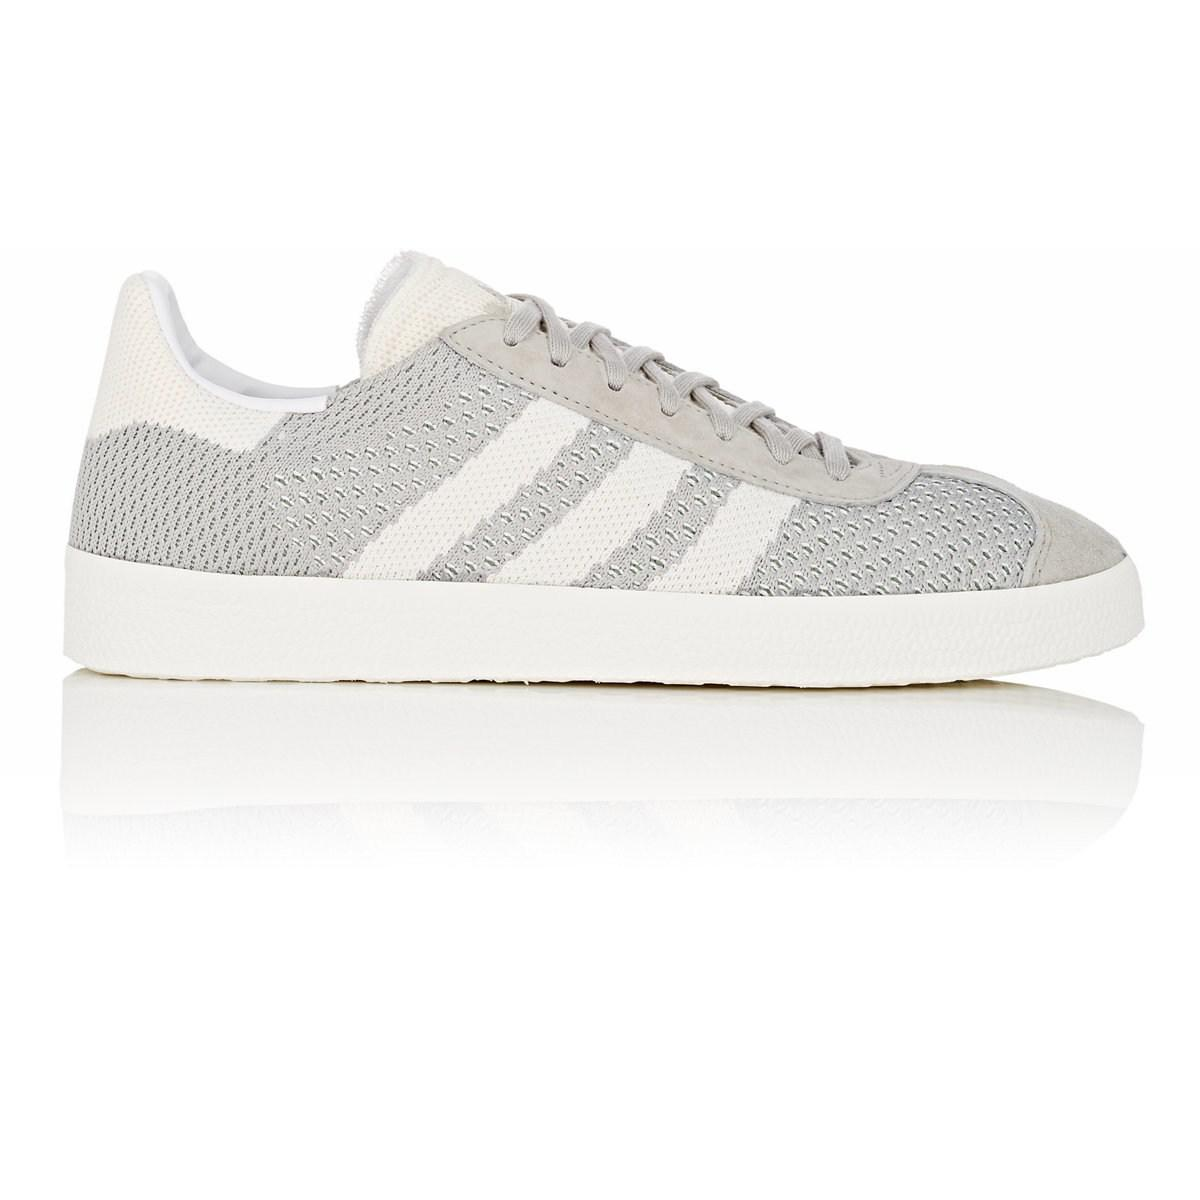 f7a05b9a2f Lyst - adidas Gazelle Primeknit Sneakers in Gray for Men